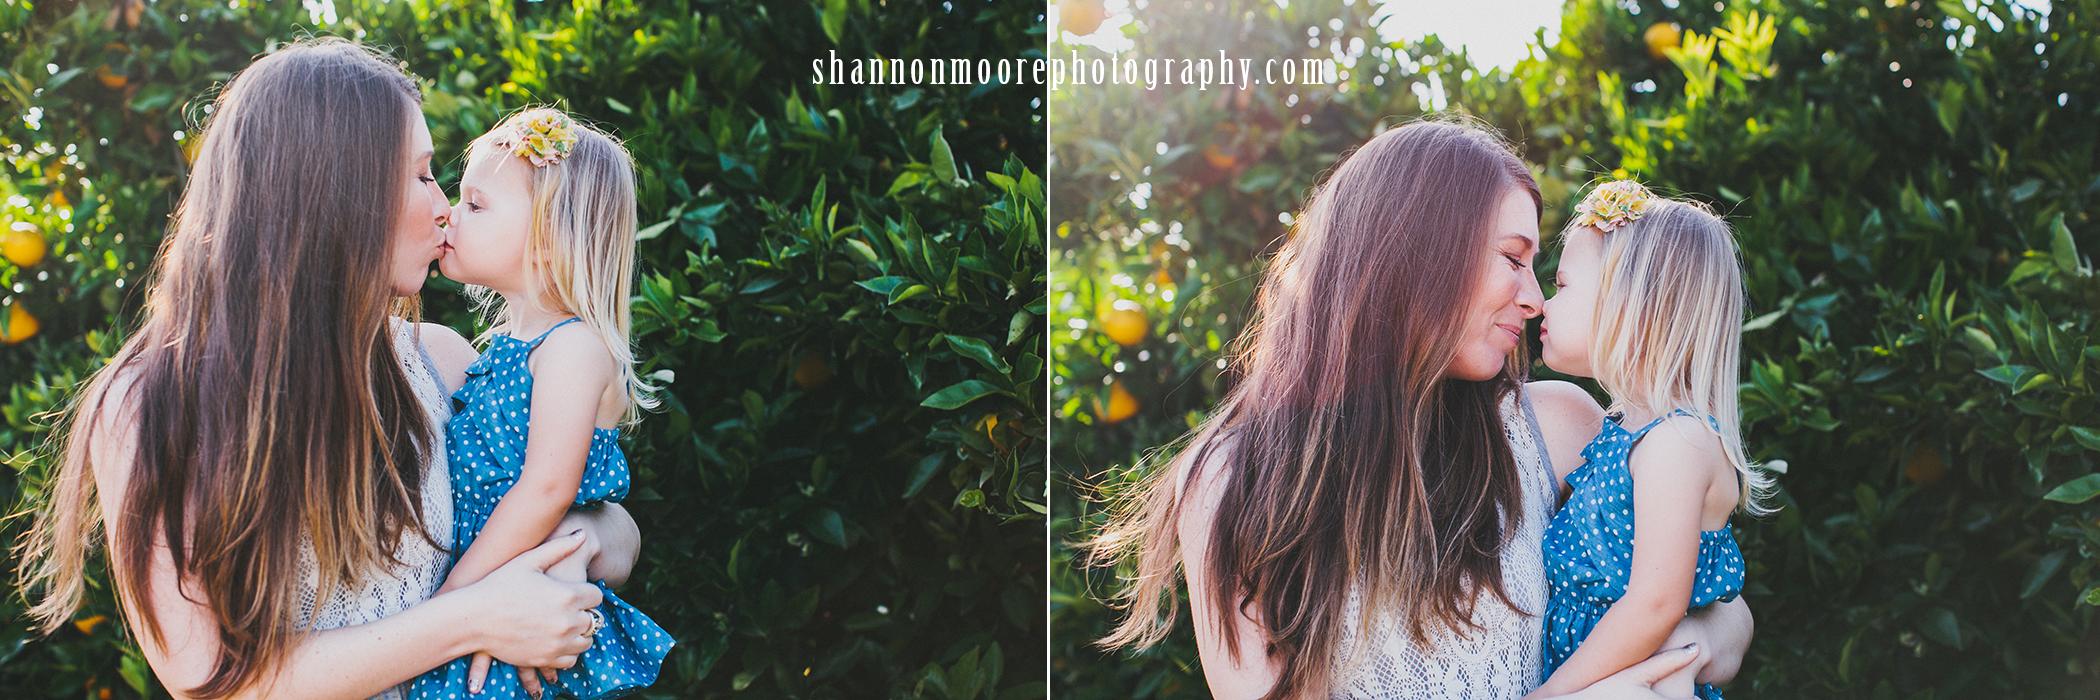 ShannonMoorePhotography-FamilyPhotography-SanLuisObispo-Ca-04